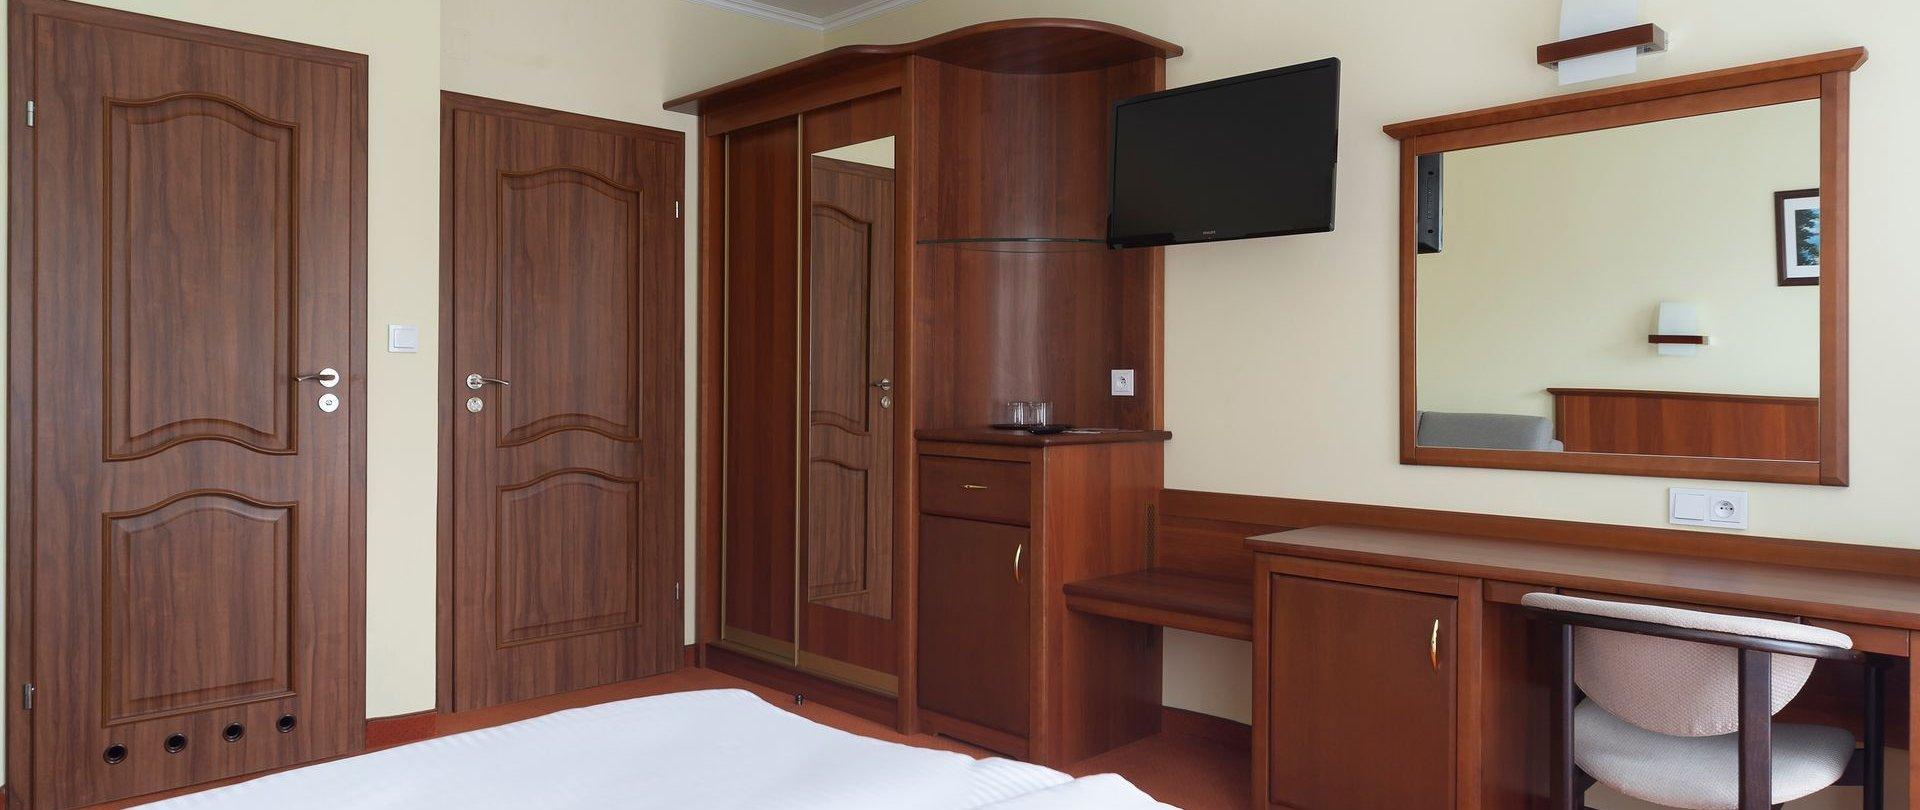 Pokój typu Standard z balkonem